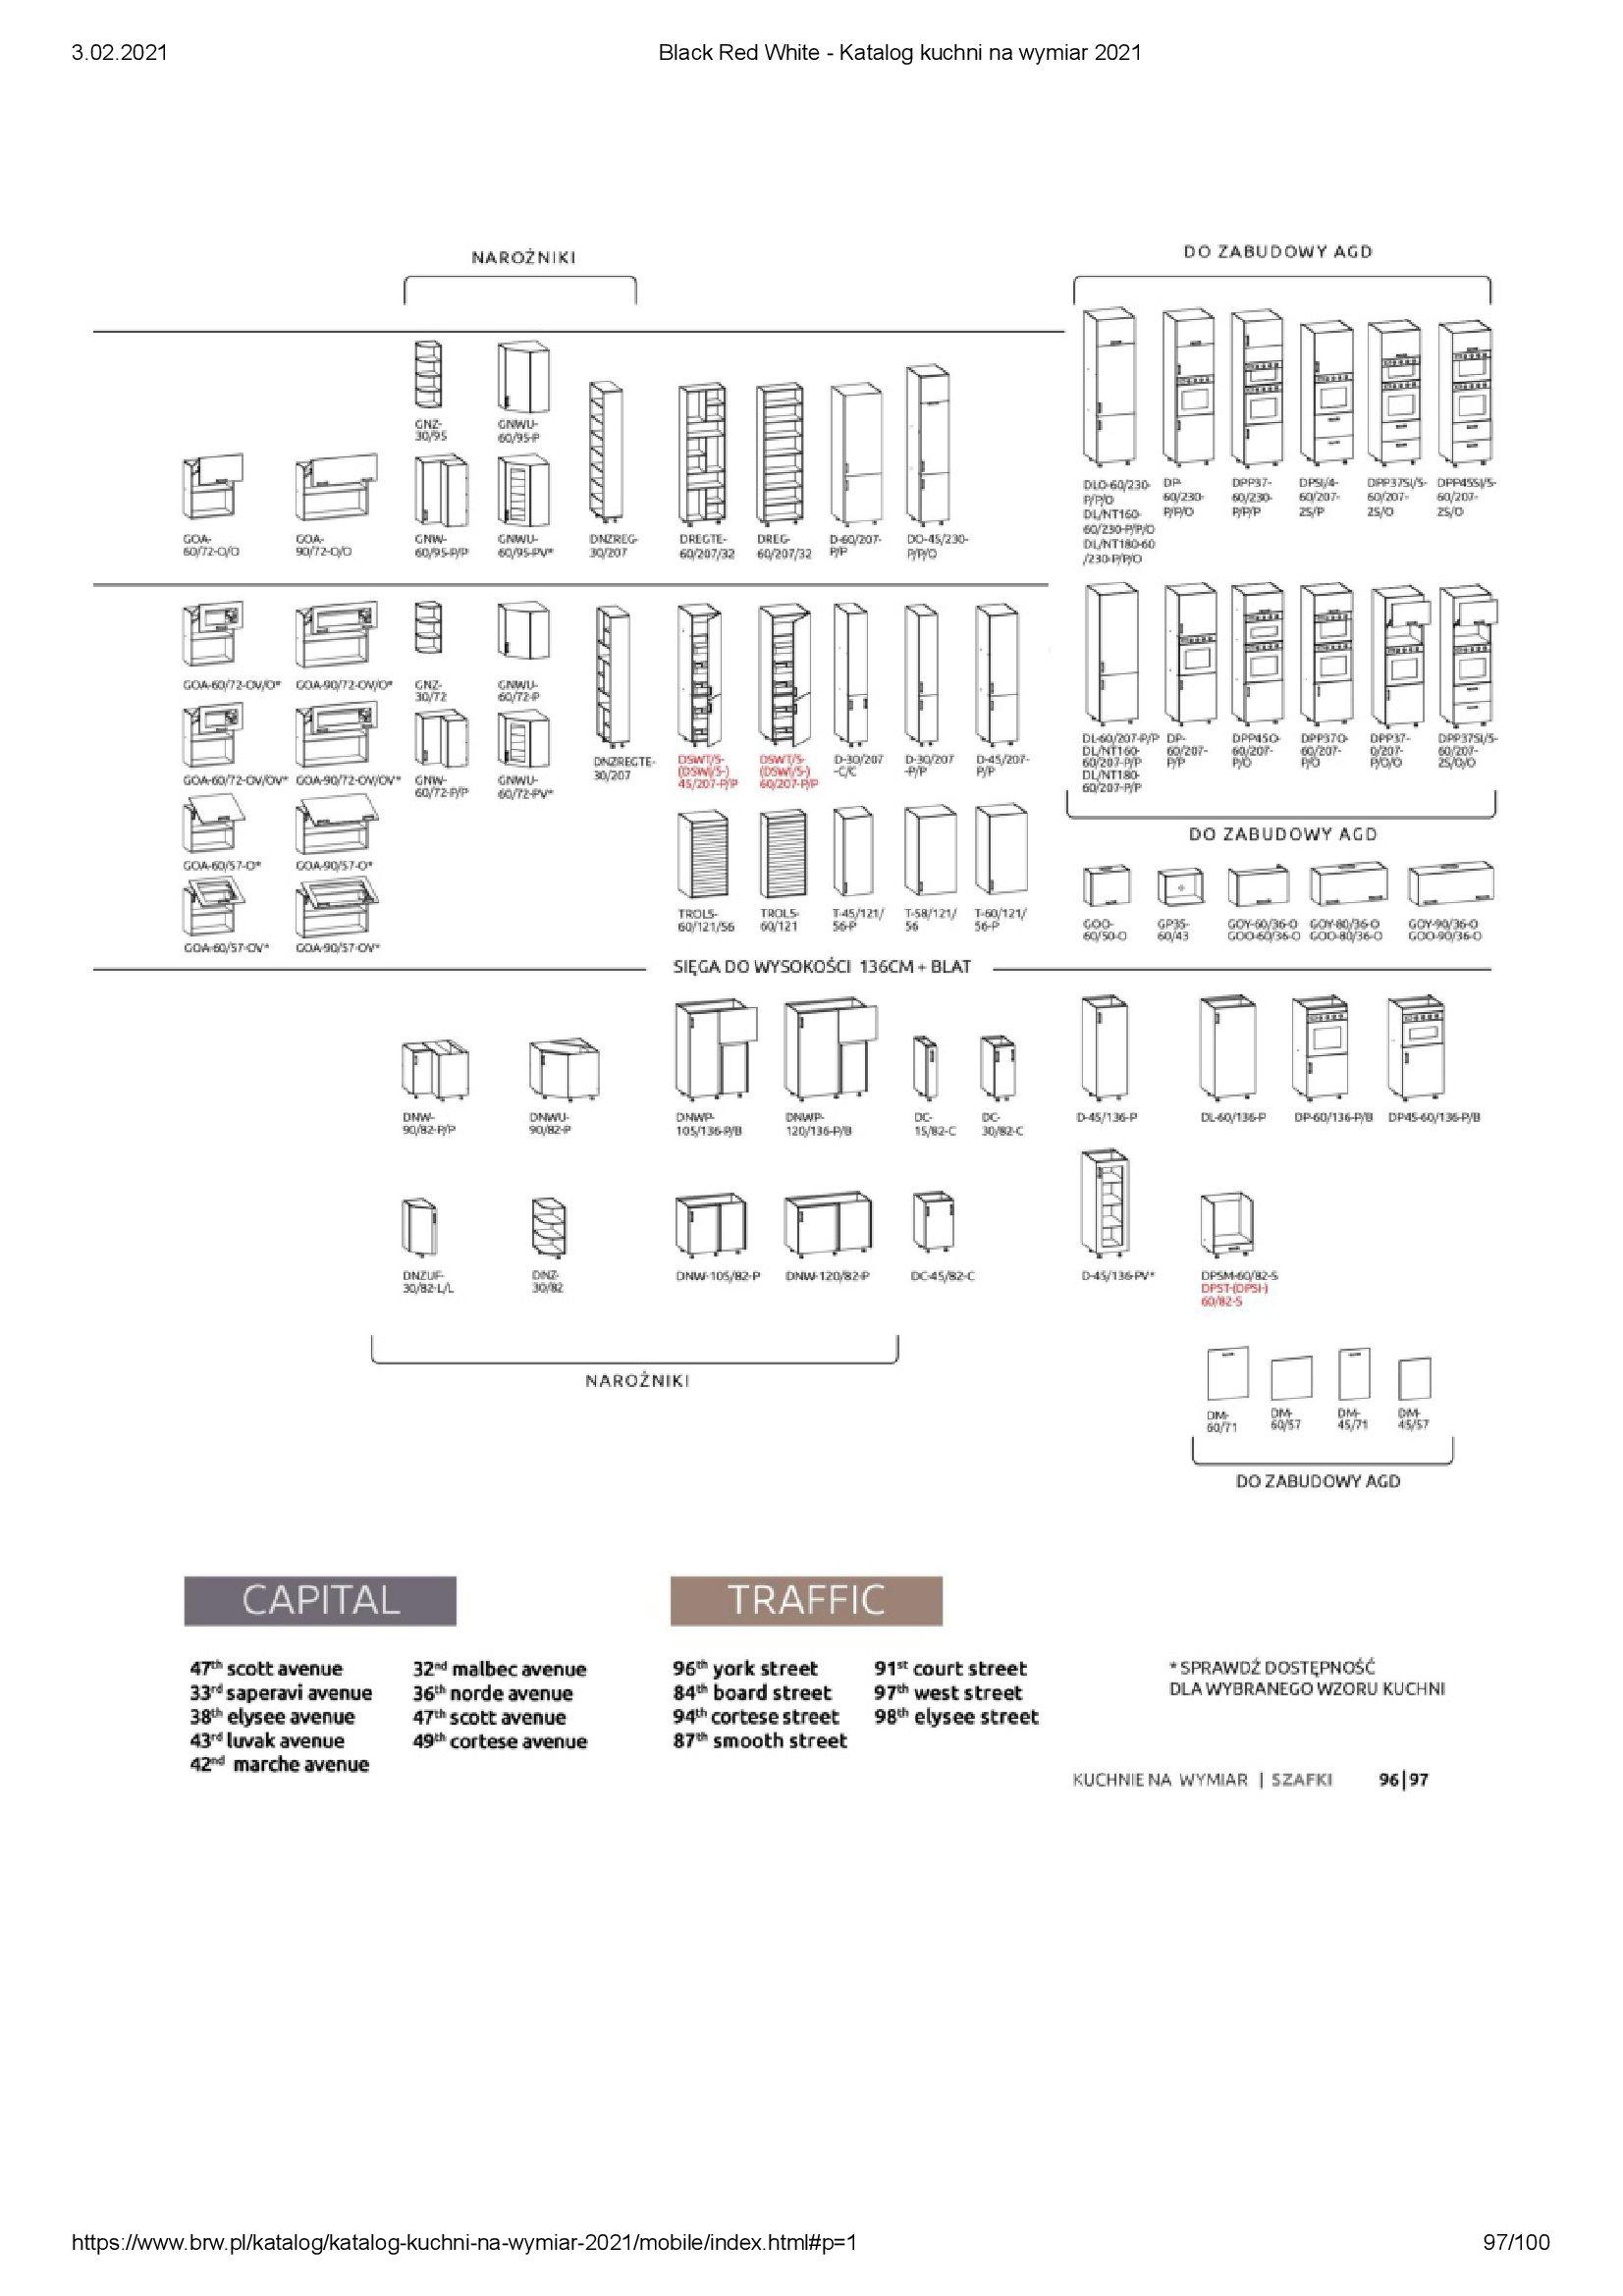 Gazetka Black Red White: Katalog - Kuchnie na wymiar Senso Kitchens 2021 2021-01-01 page-97